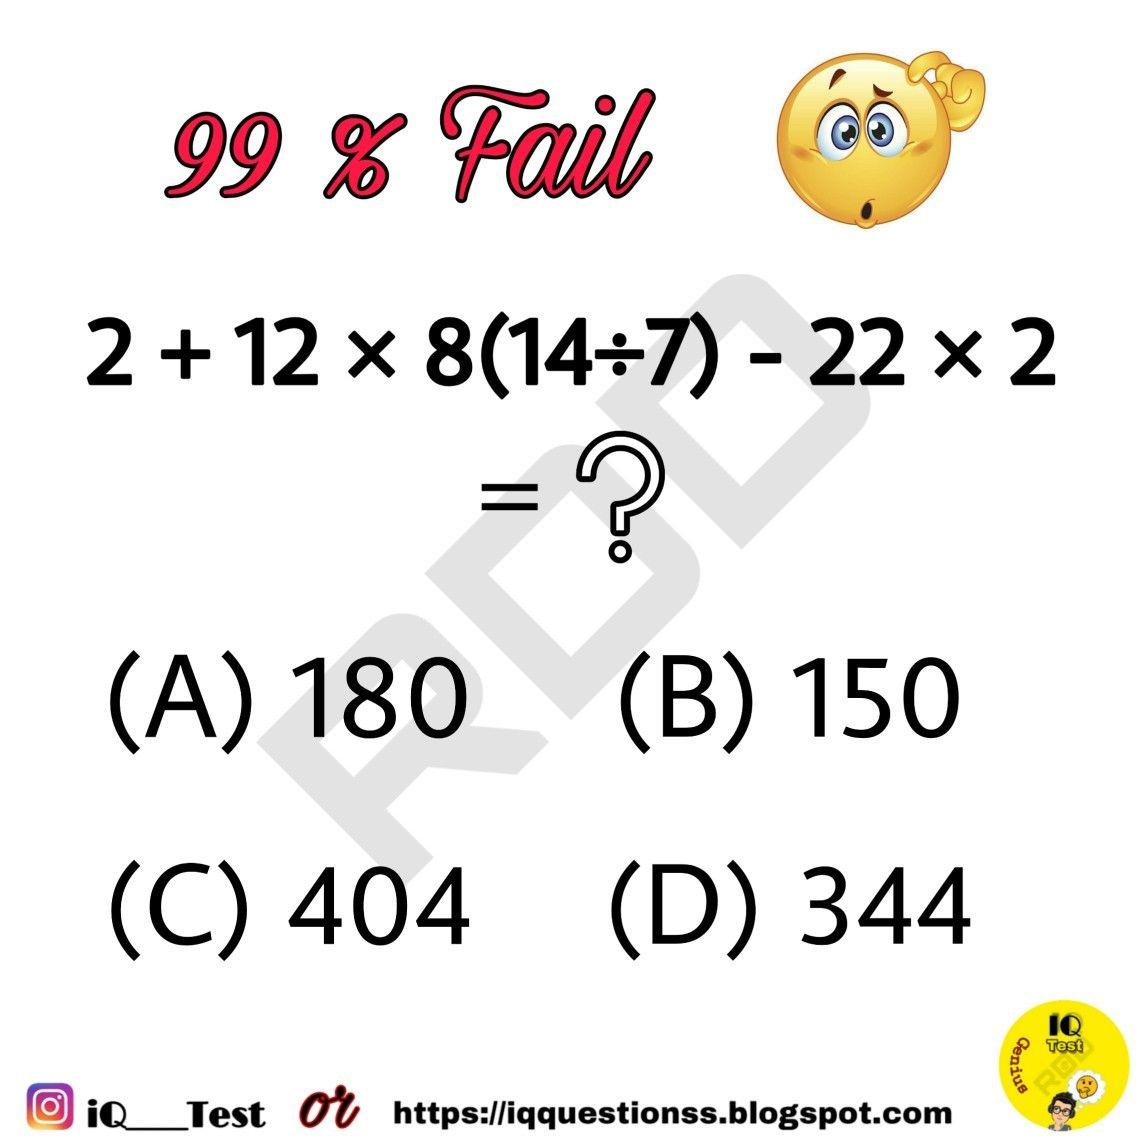 17 Iq Question Bodmas Mathematics Math [ 1145 x 1145 Pixel ]